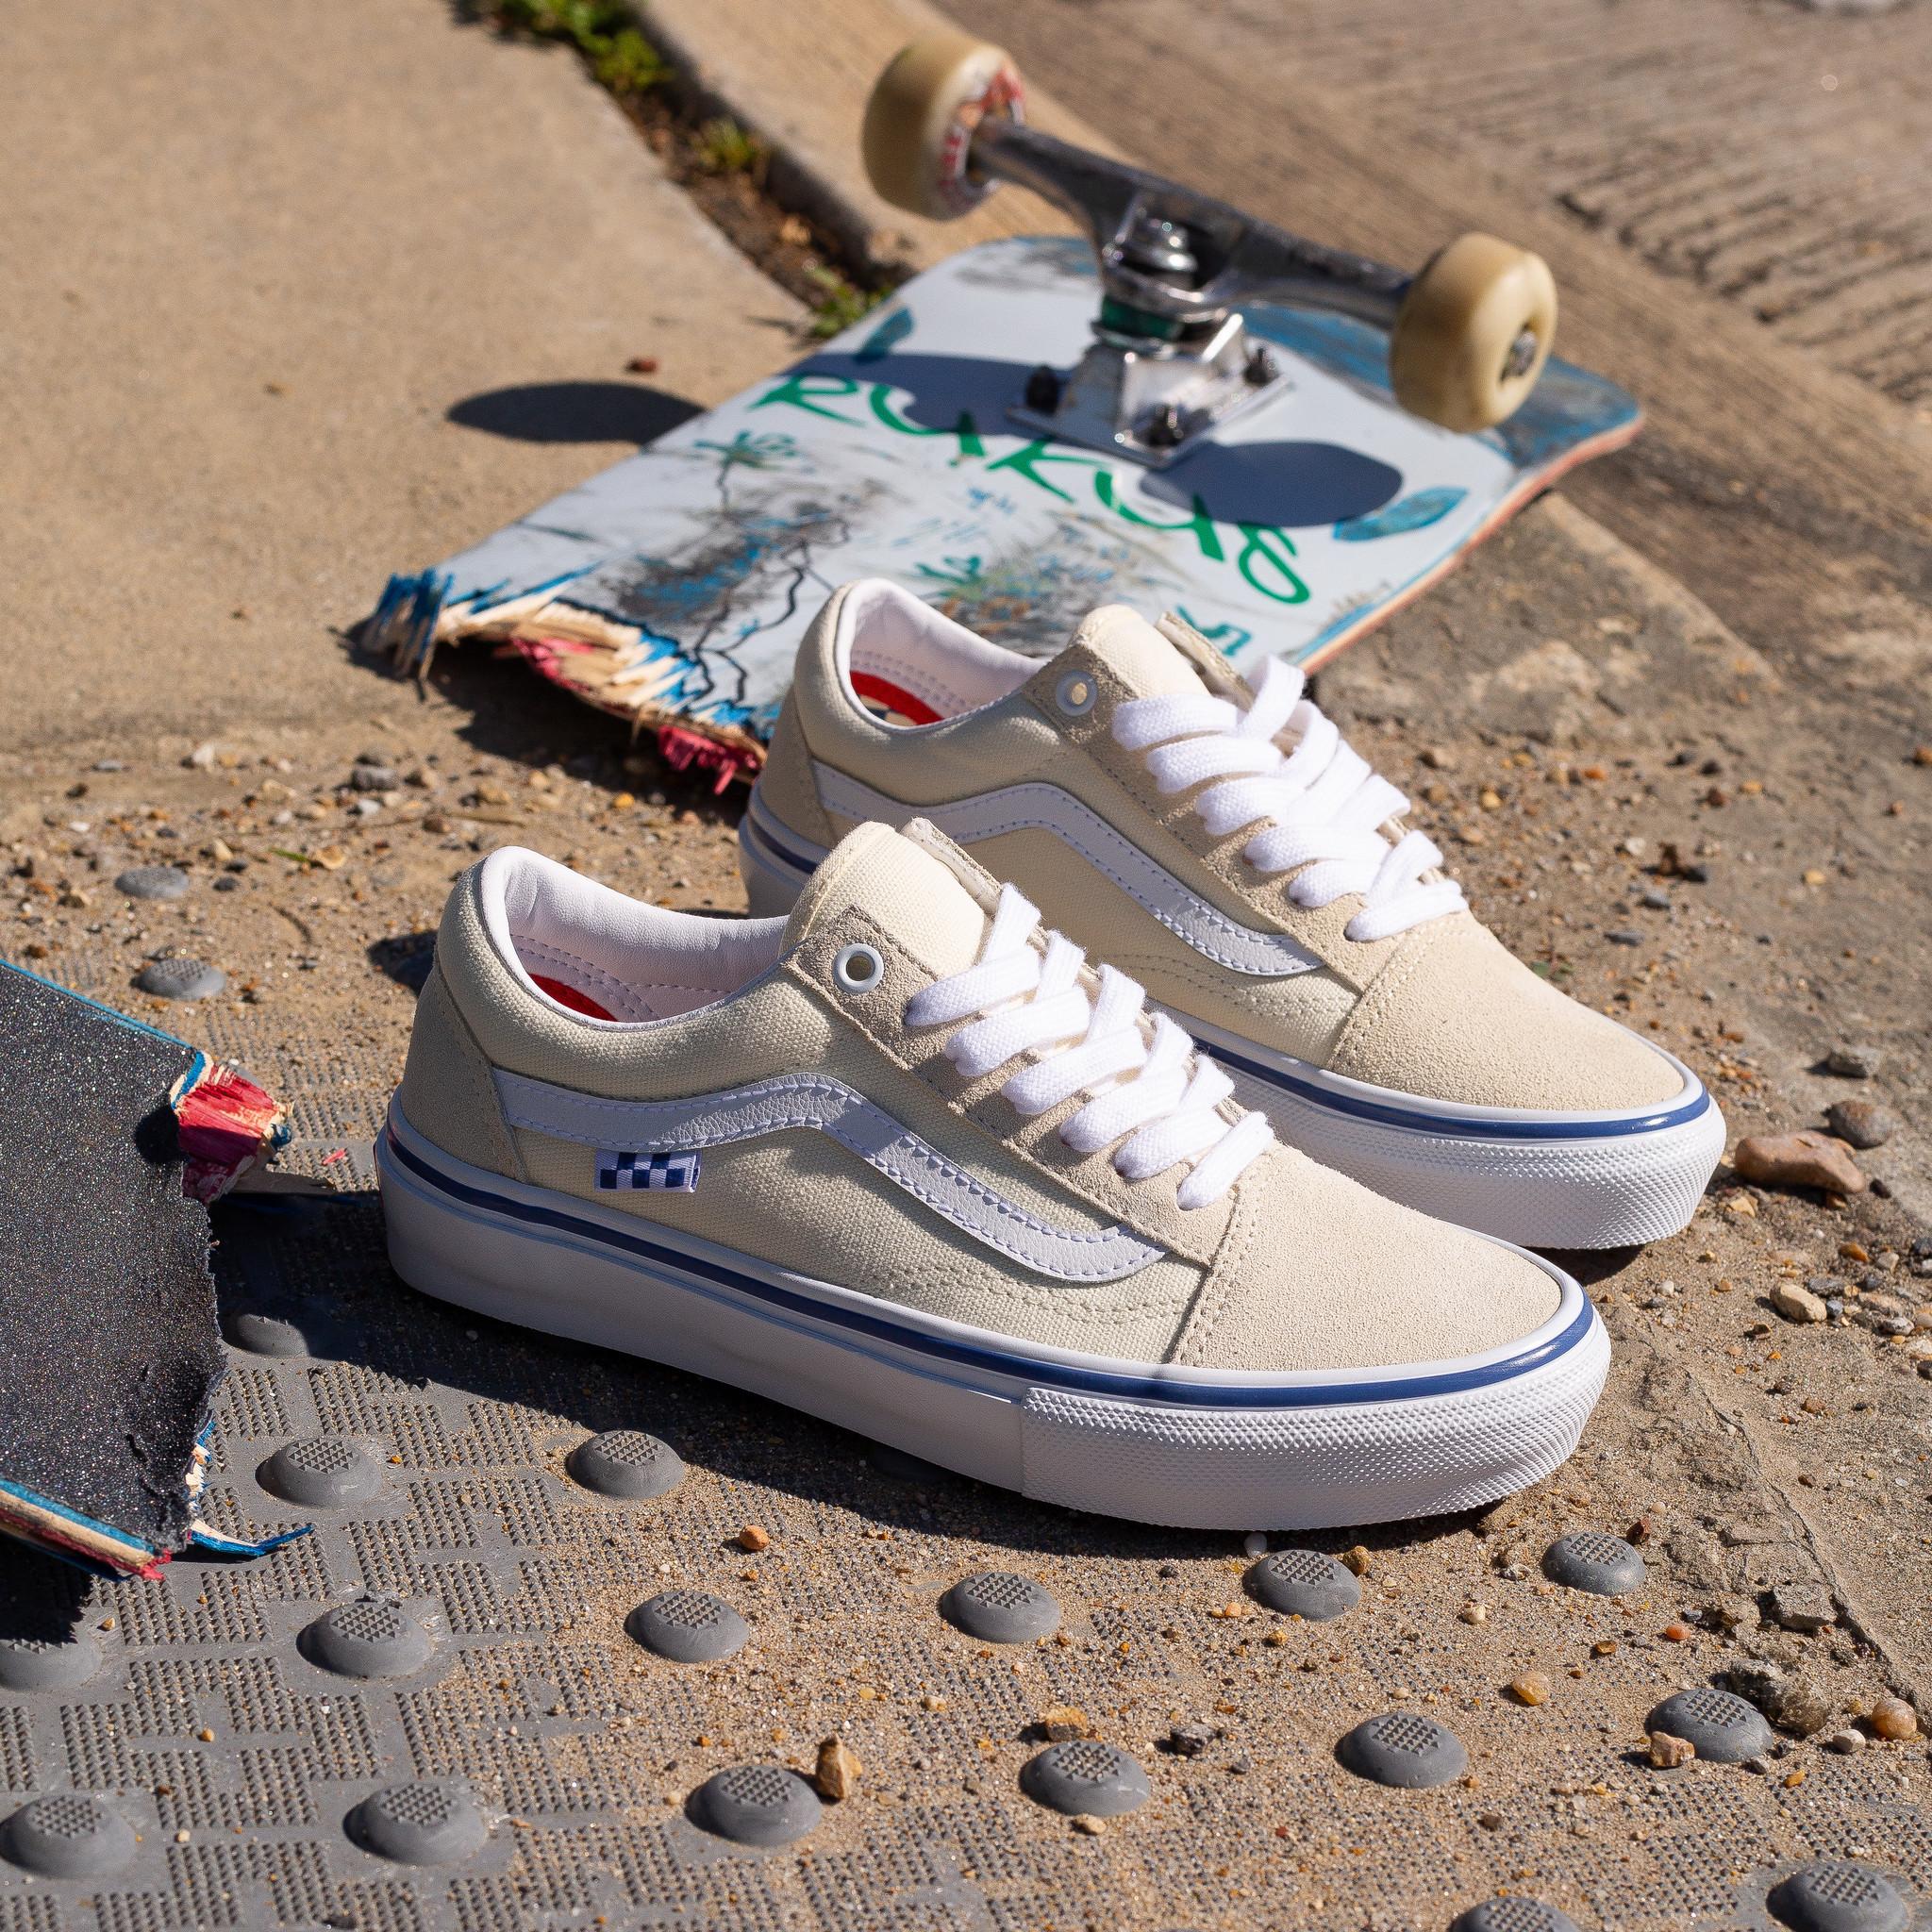 Vans Skate Old Skool Off White